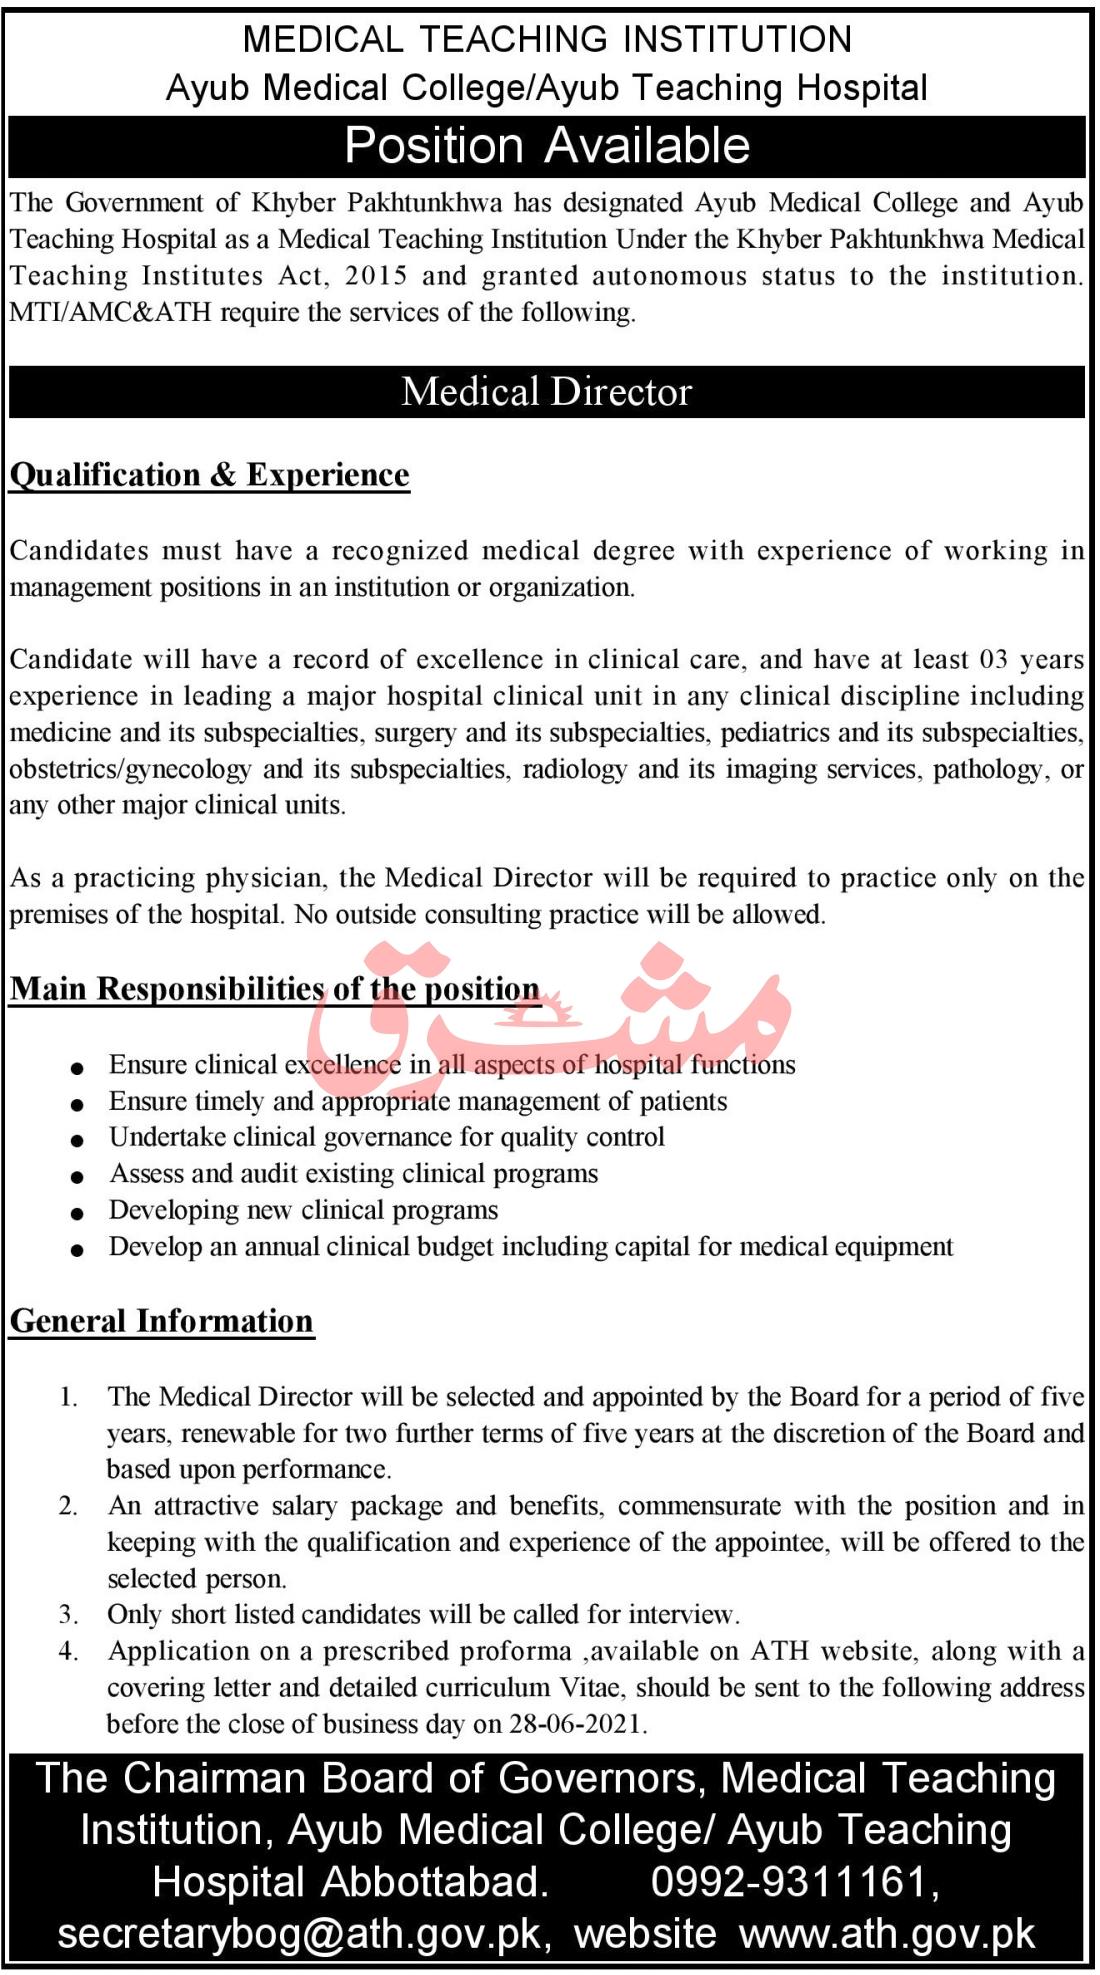 Medical Teaching Institution Jobs 2021 in Abbottabad